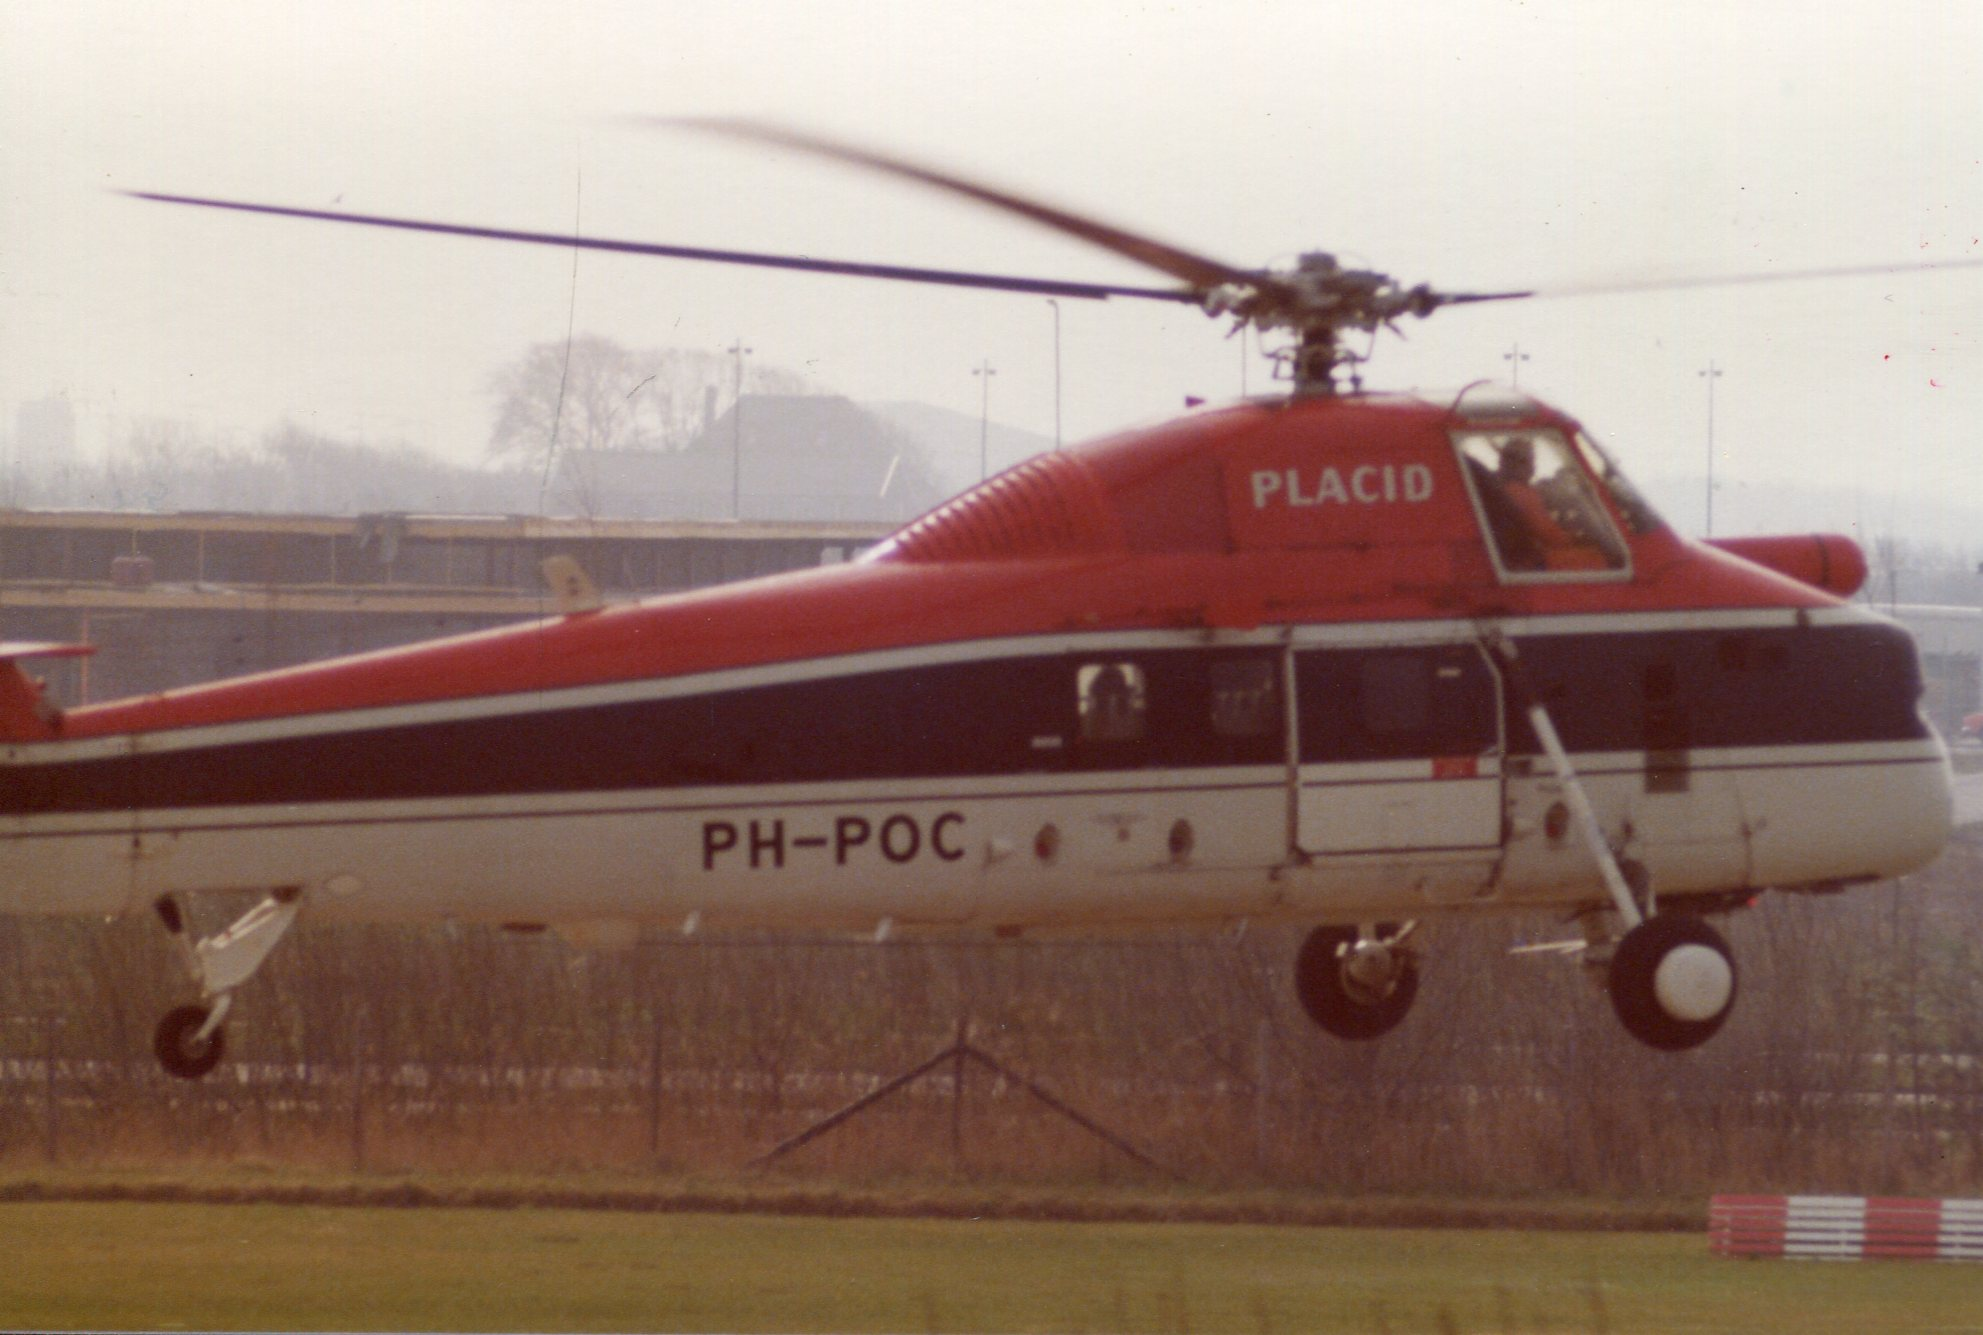 Naam: Den Helder , april 1977.jpg Bekeken: 240 Grootte: 279,4 KB